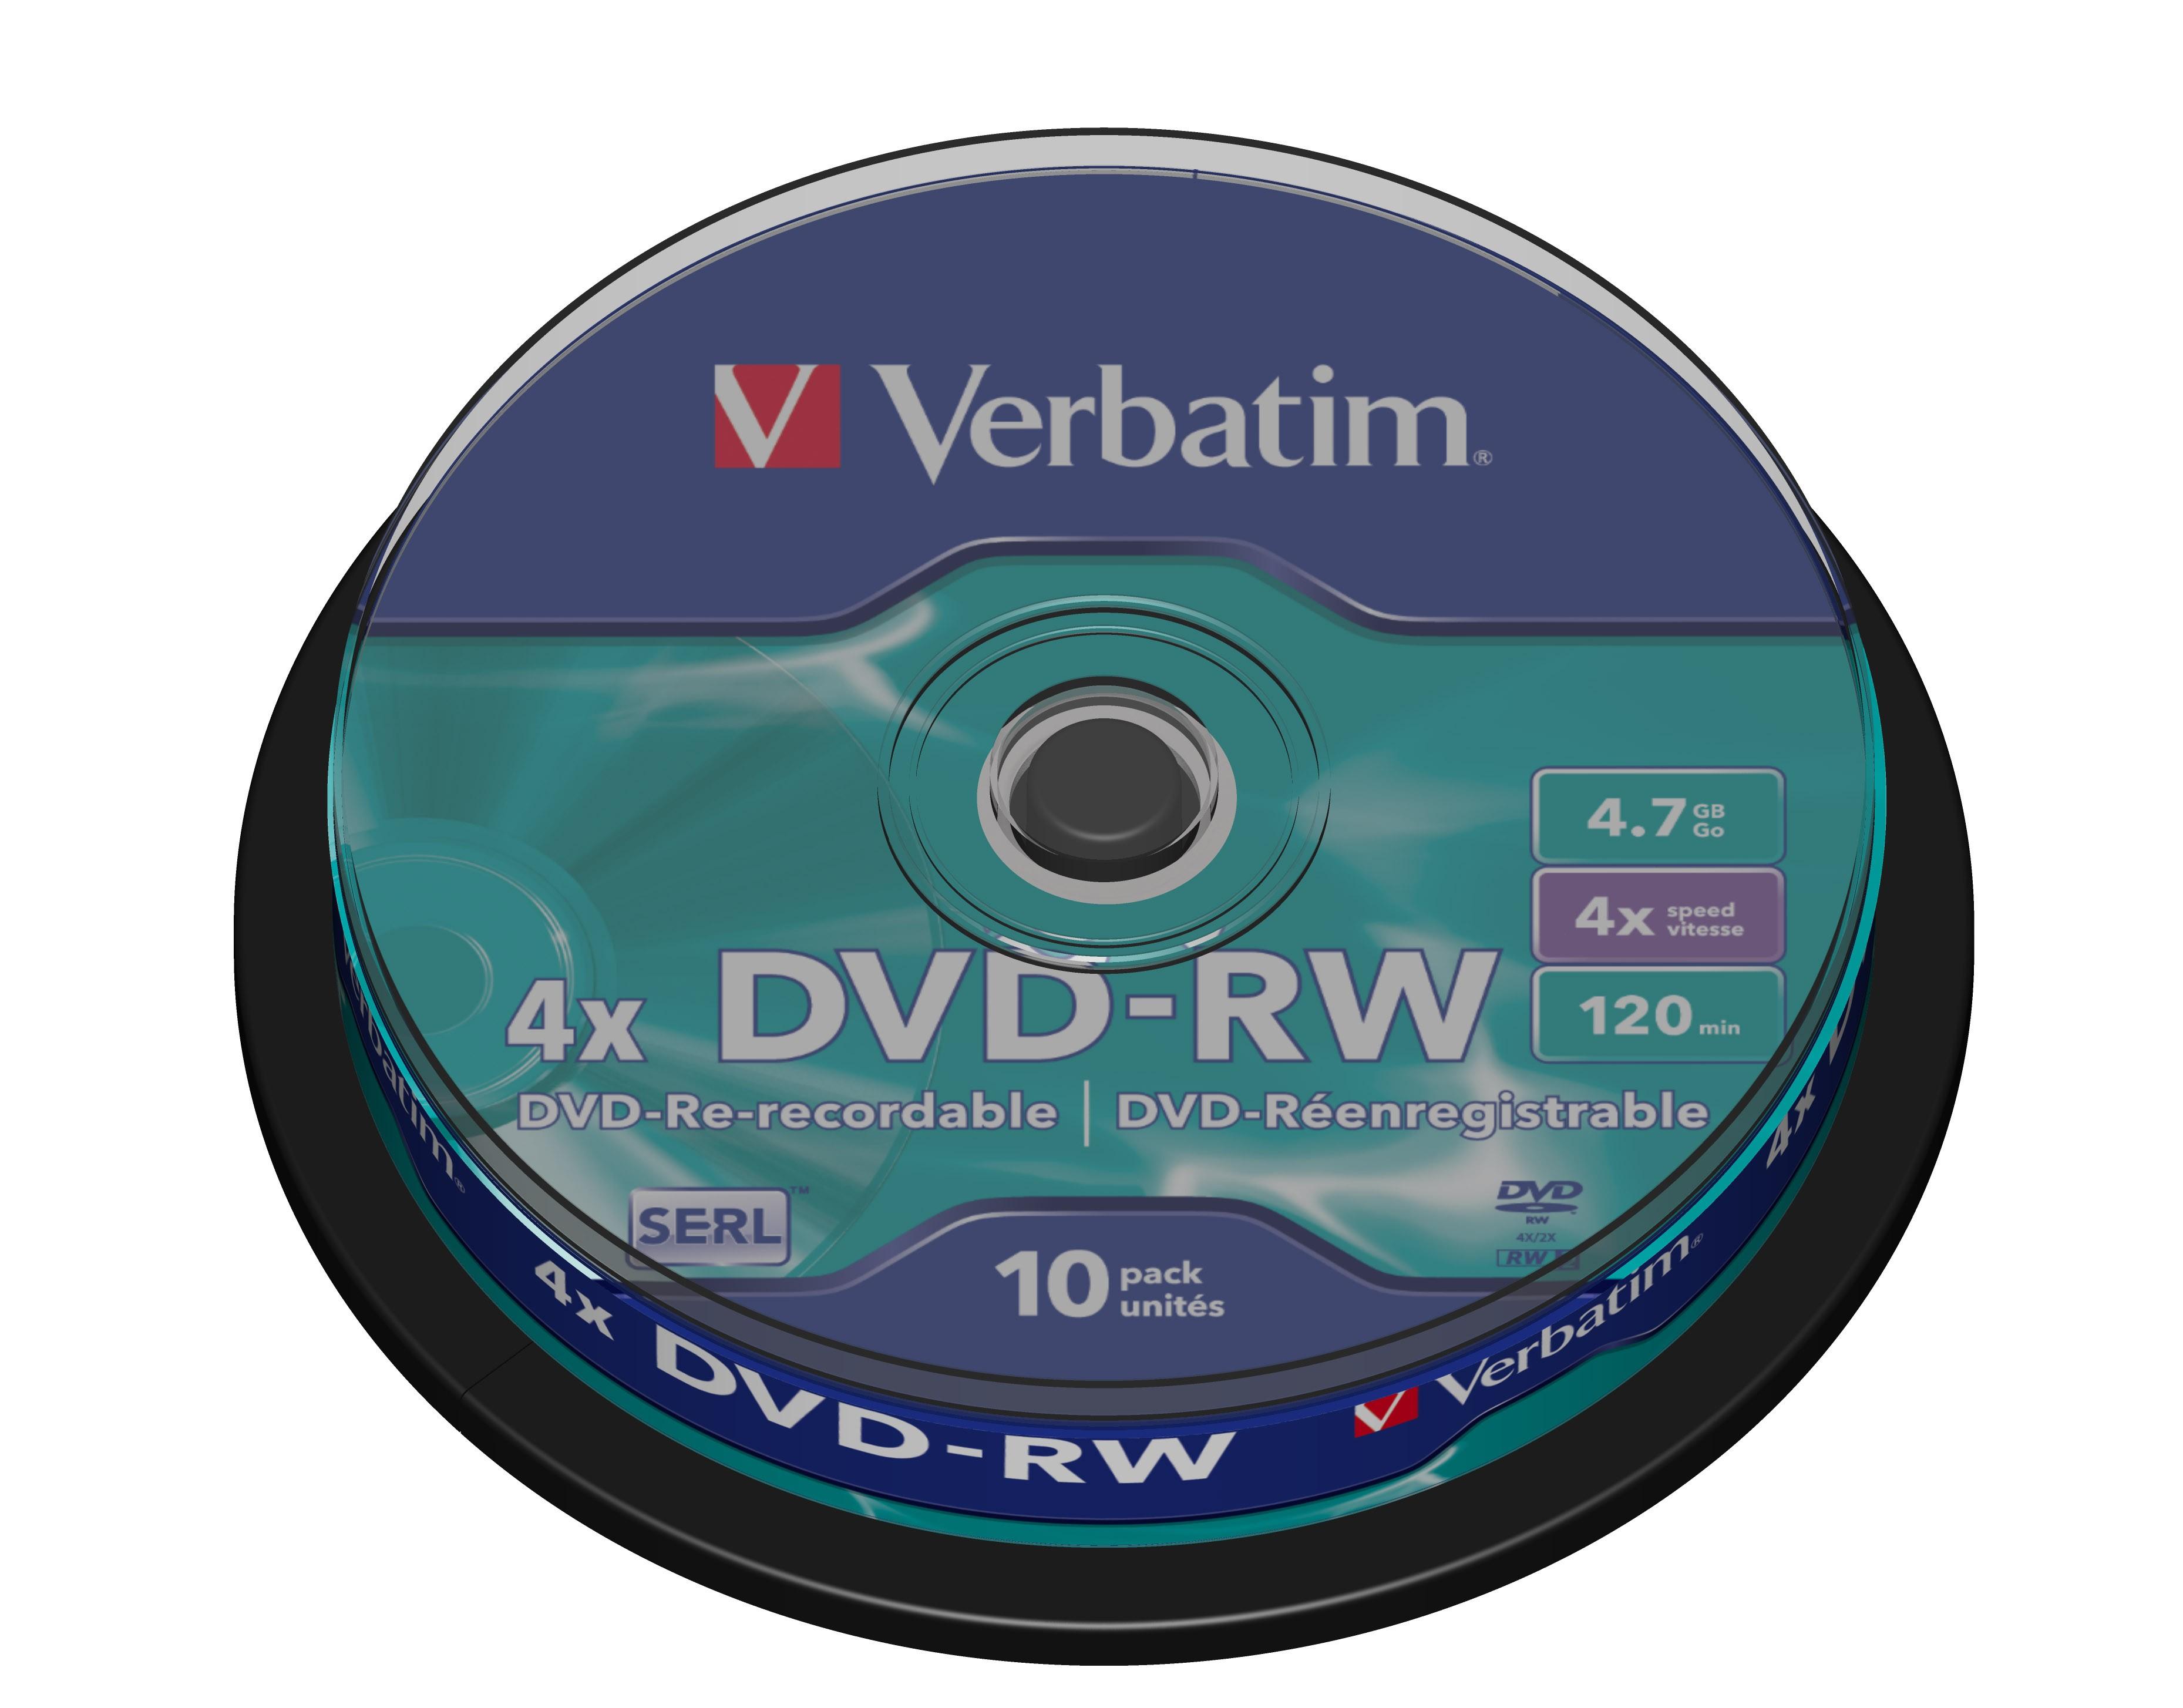 DVD-RW 4,7 GB, 4 speed, SERL, Scratch resistant (10-spindel)